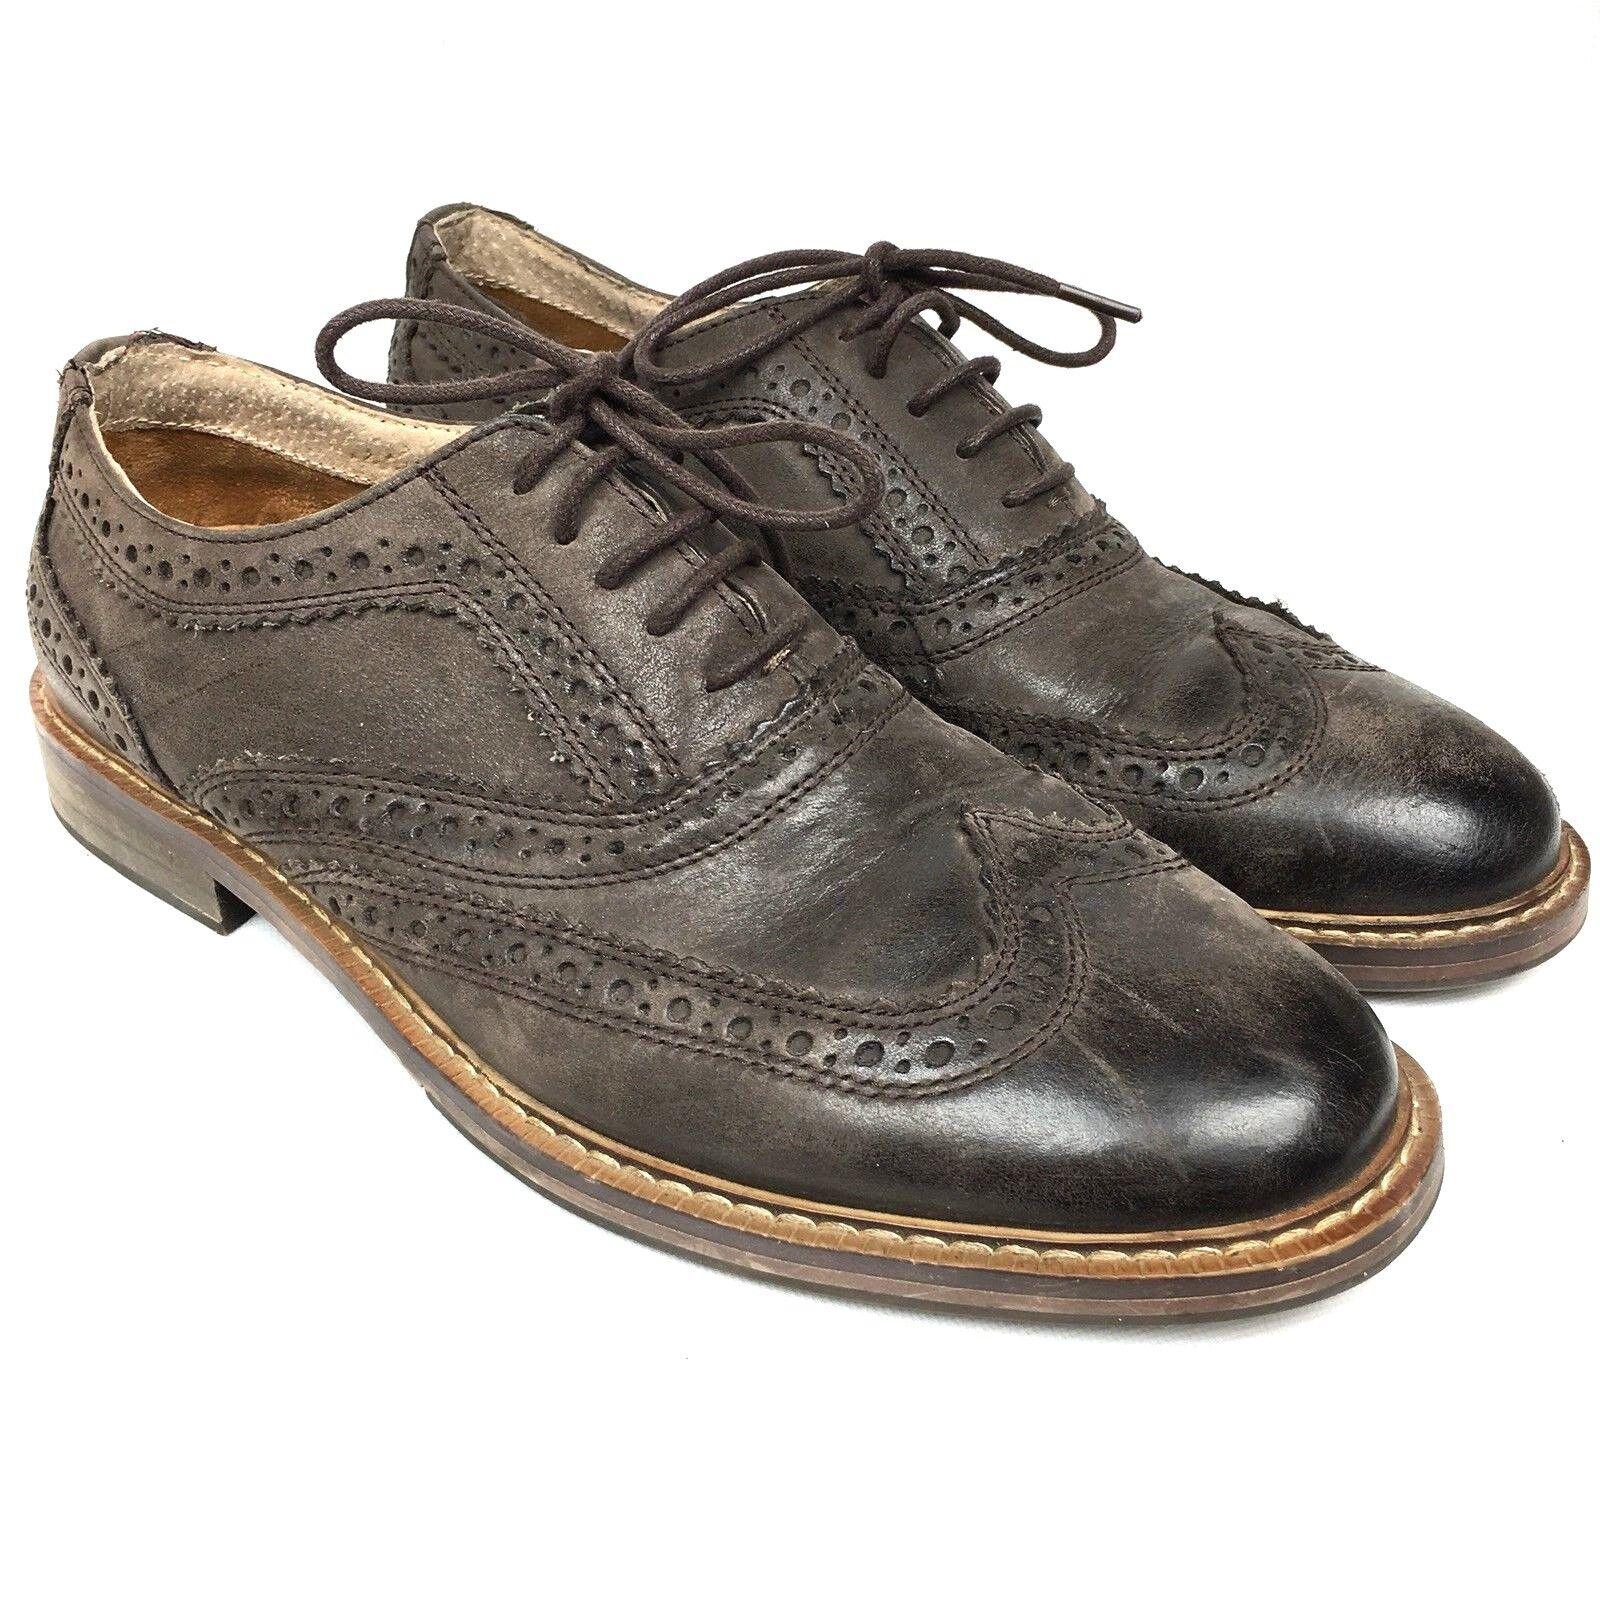 STEVE MADDEN Daxx Men's Sz Oxfords 10 Brown Nubuck Wingtip Oxfords Sz Shoes 150731